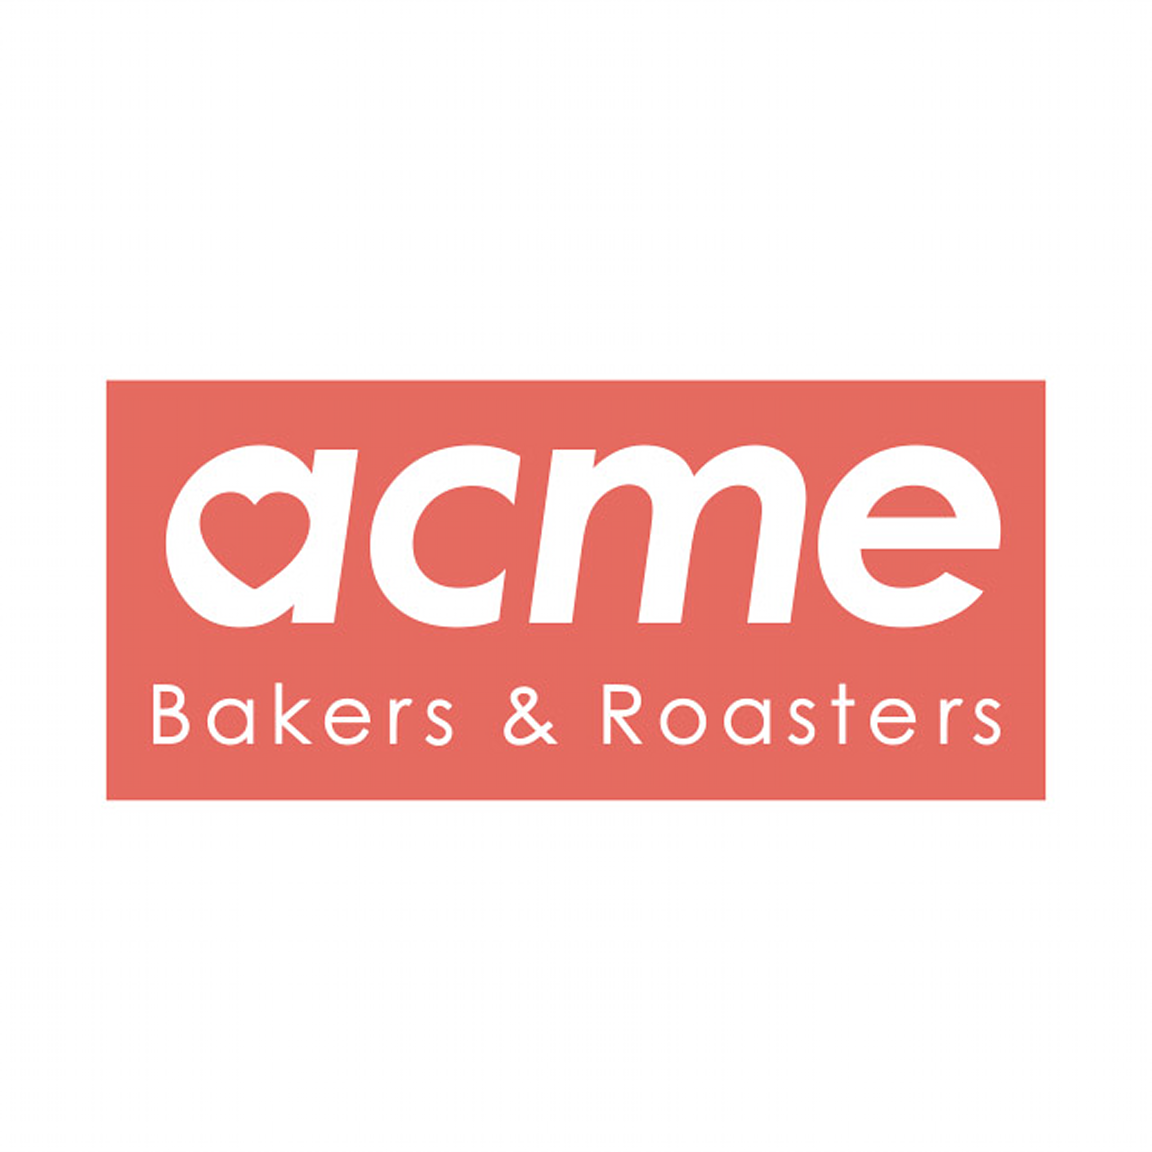 acme-bakers-roasters-logo